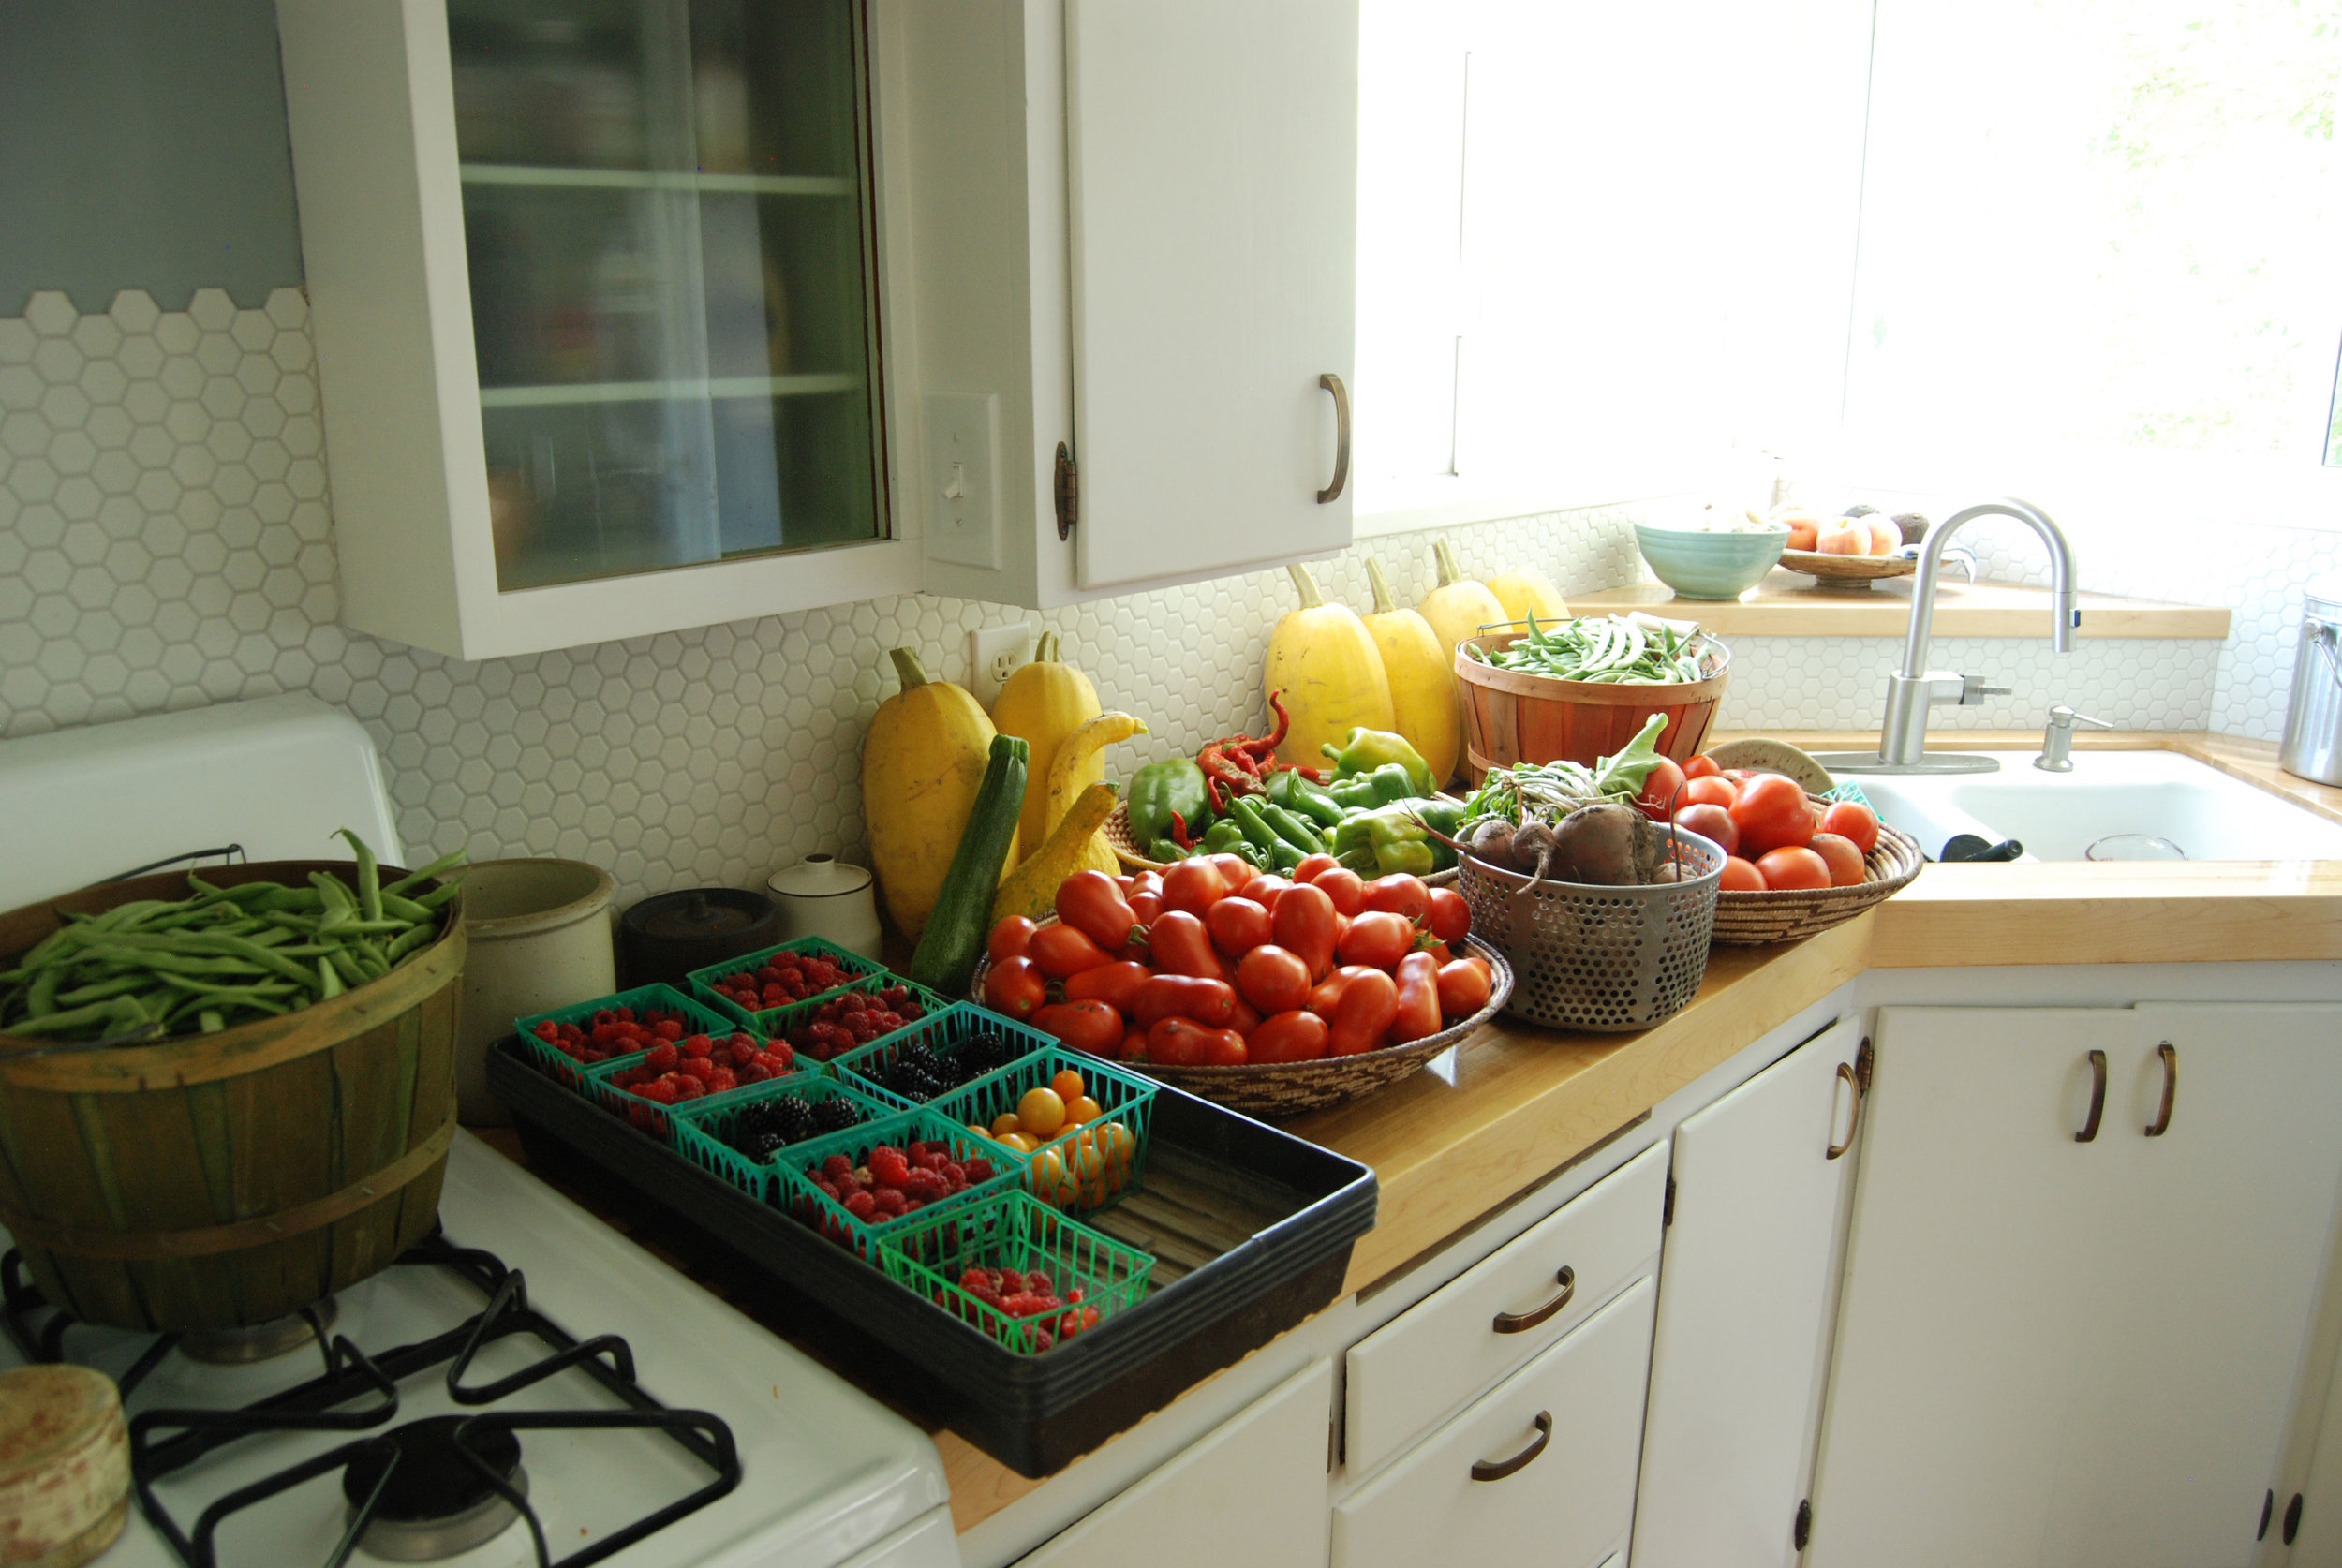 mark-crenshaw-garden-food.jpg